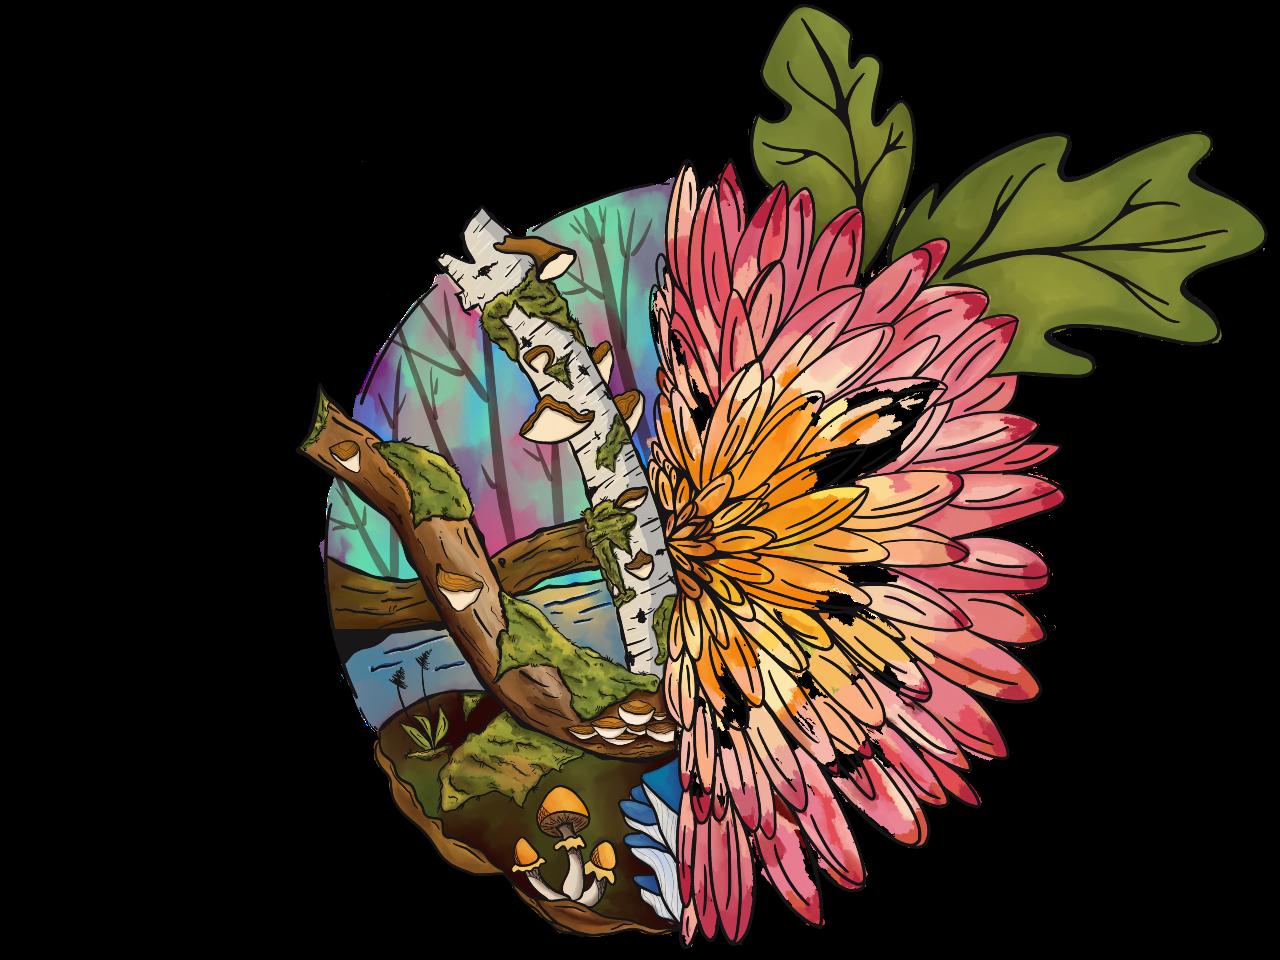 illustration of mums, mosses and mushrooms